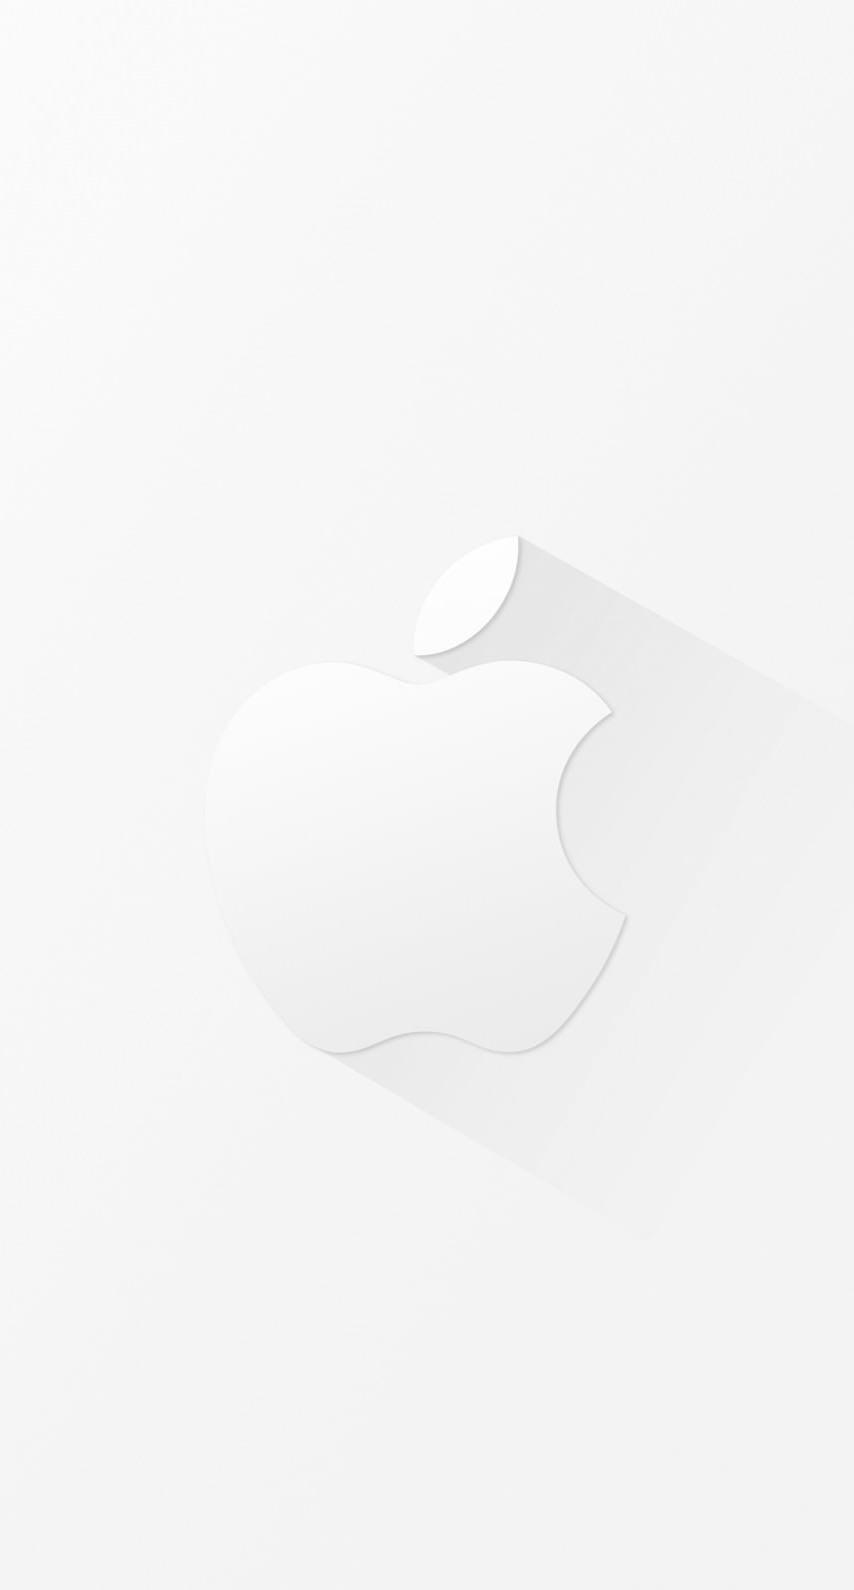 Cool White Apple Logo Wallpaper Sc Iphone6s